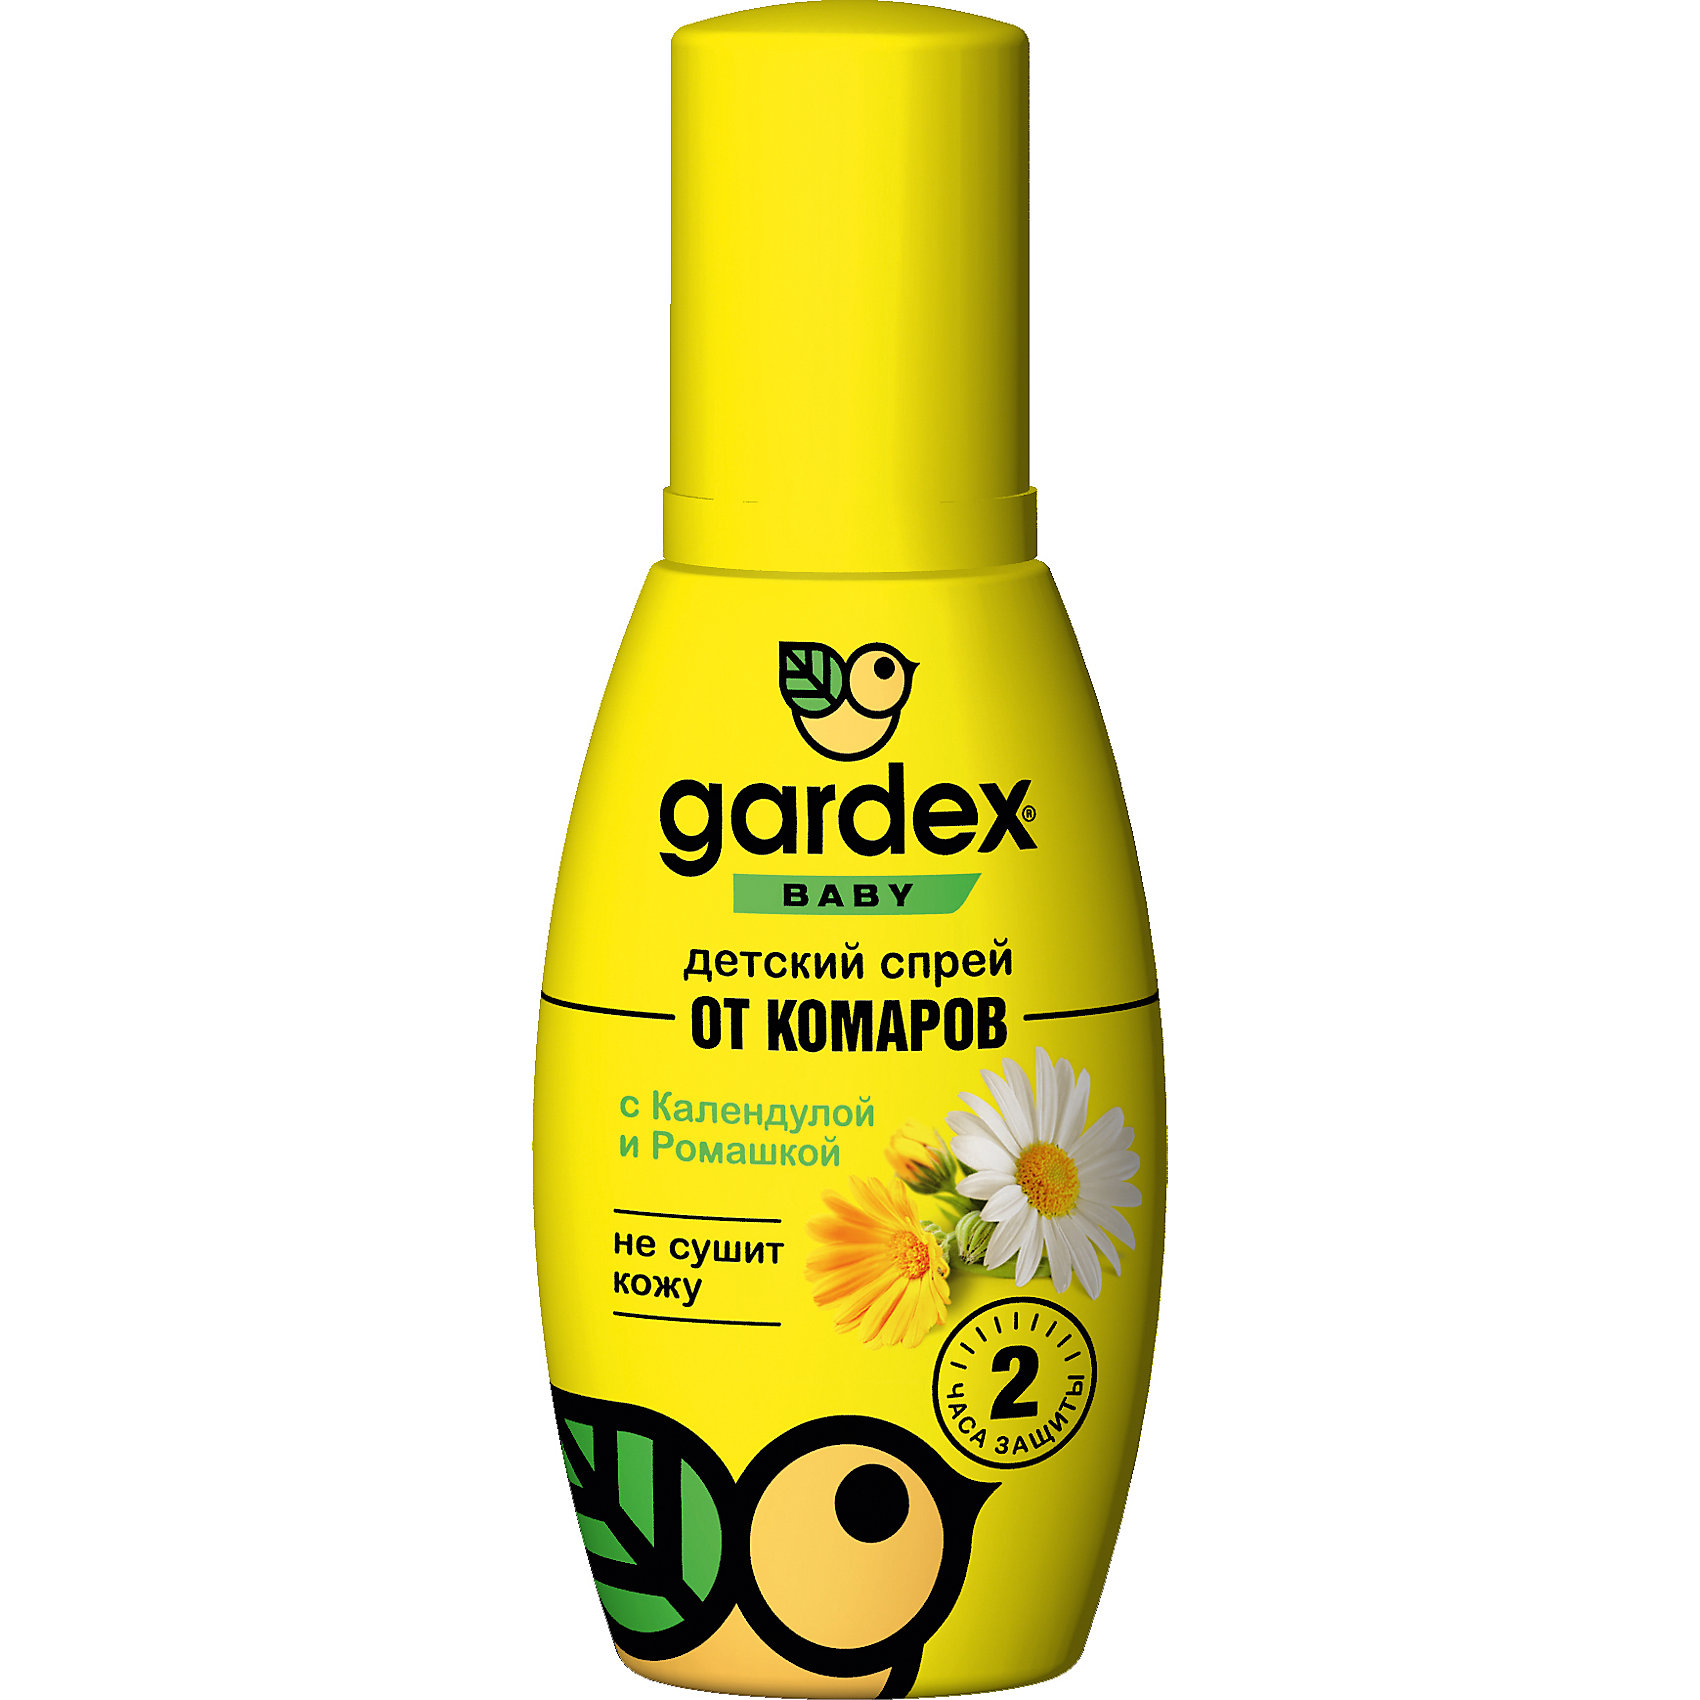 Спрей от комаров, с 2-х лет, 100 мл., Gardex Baby